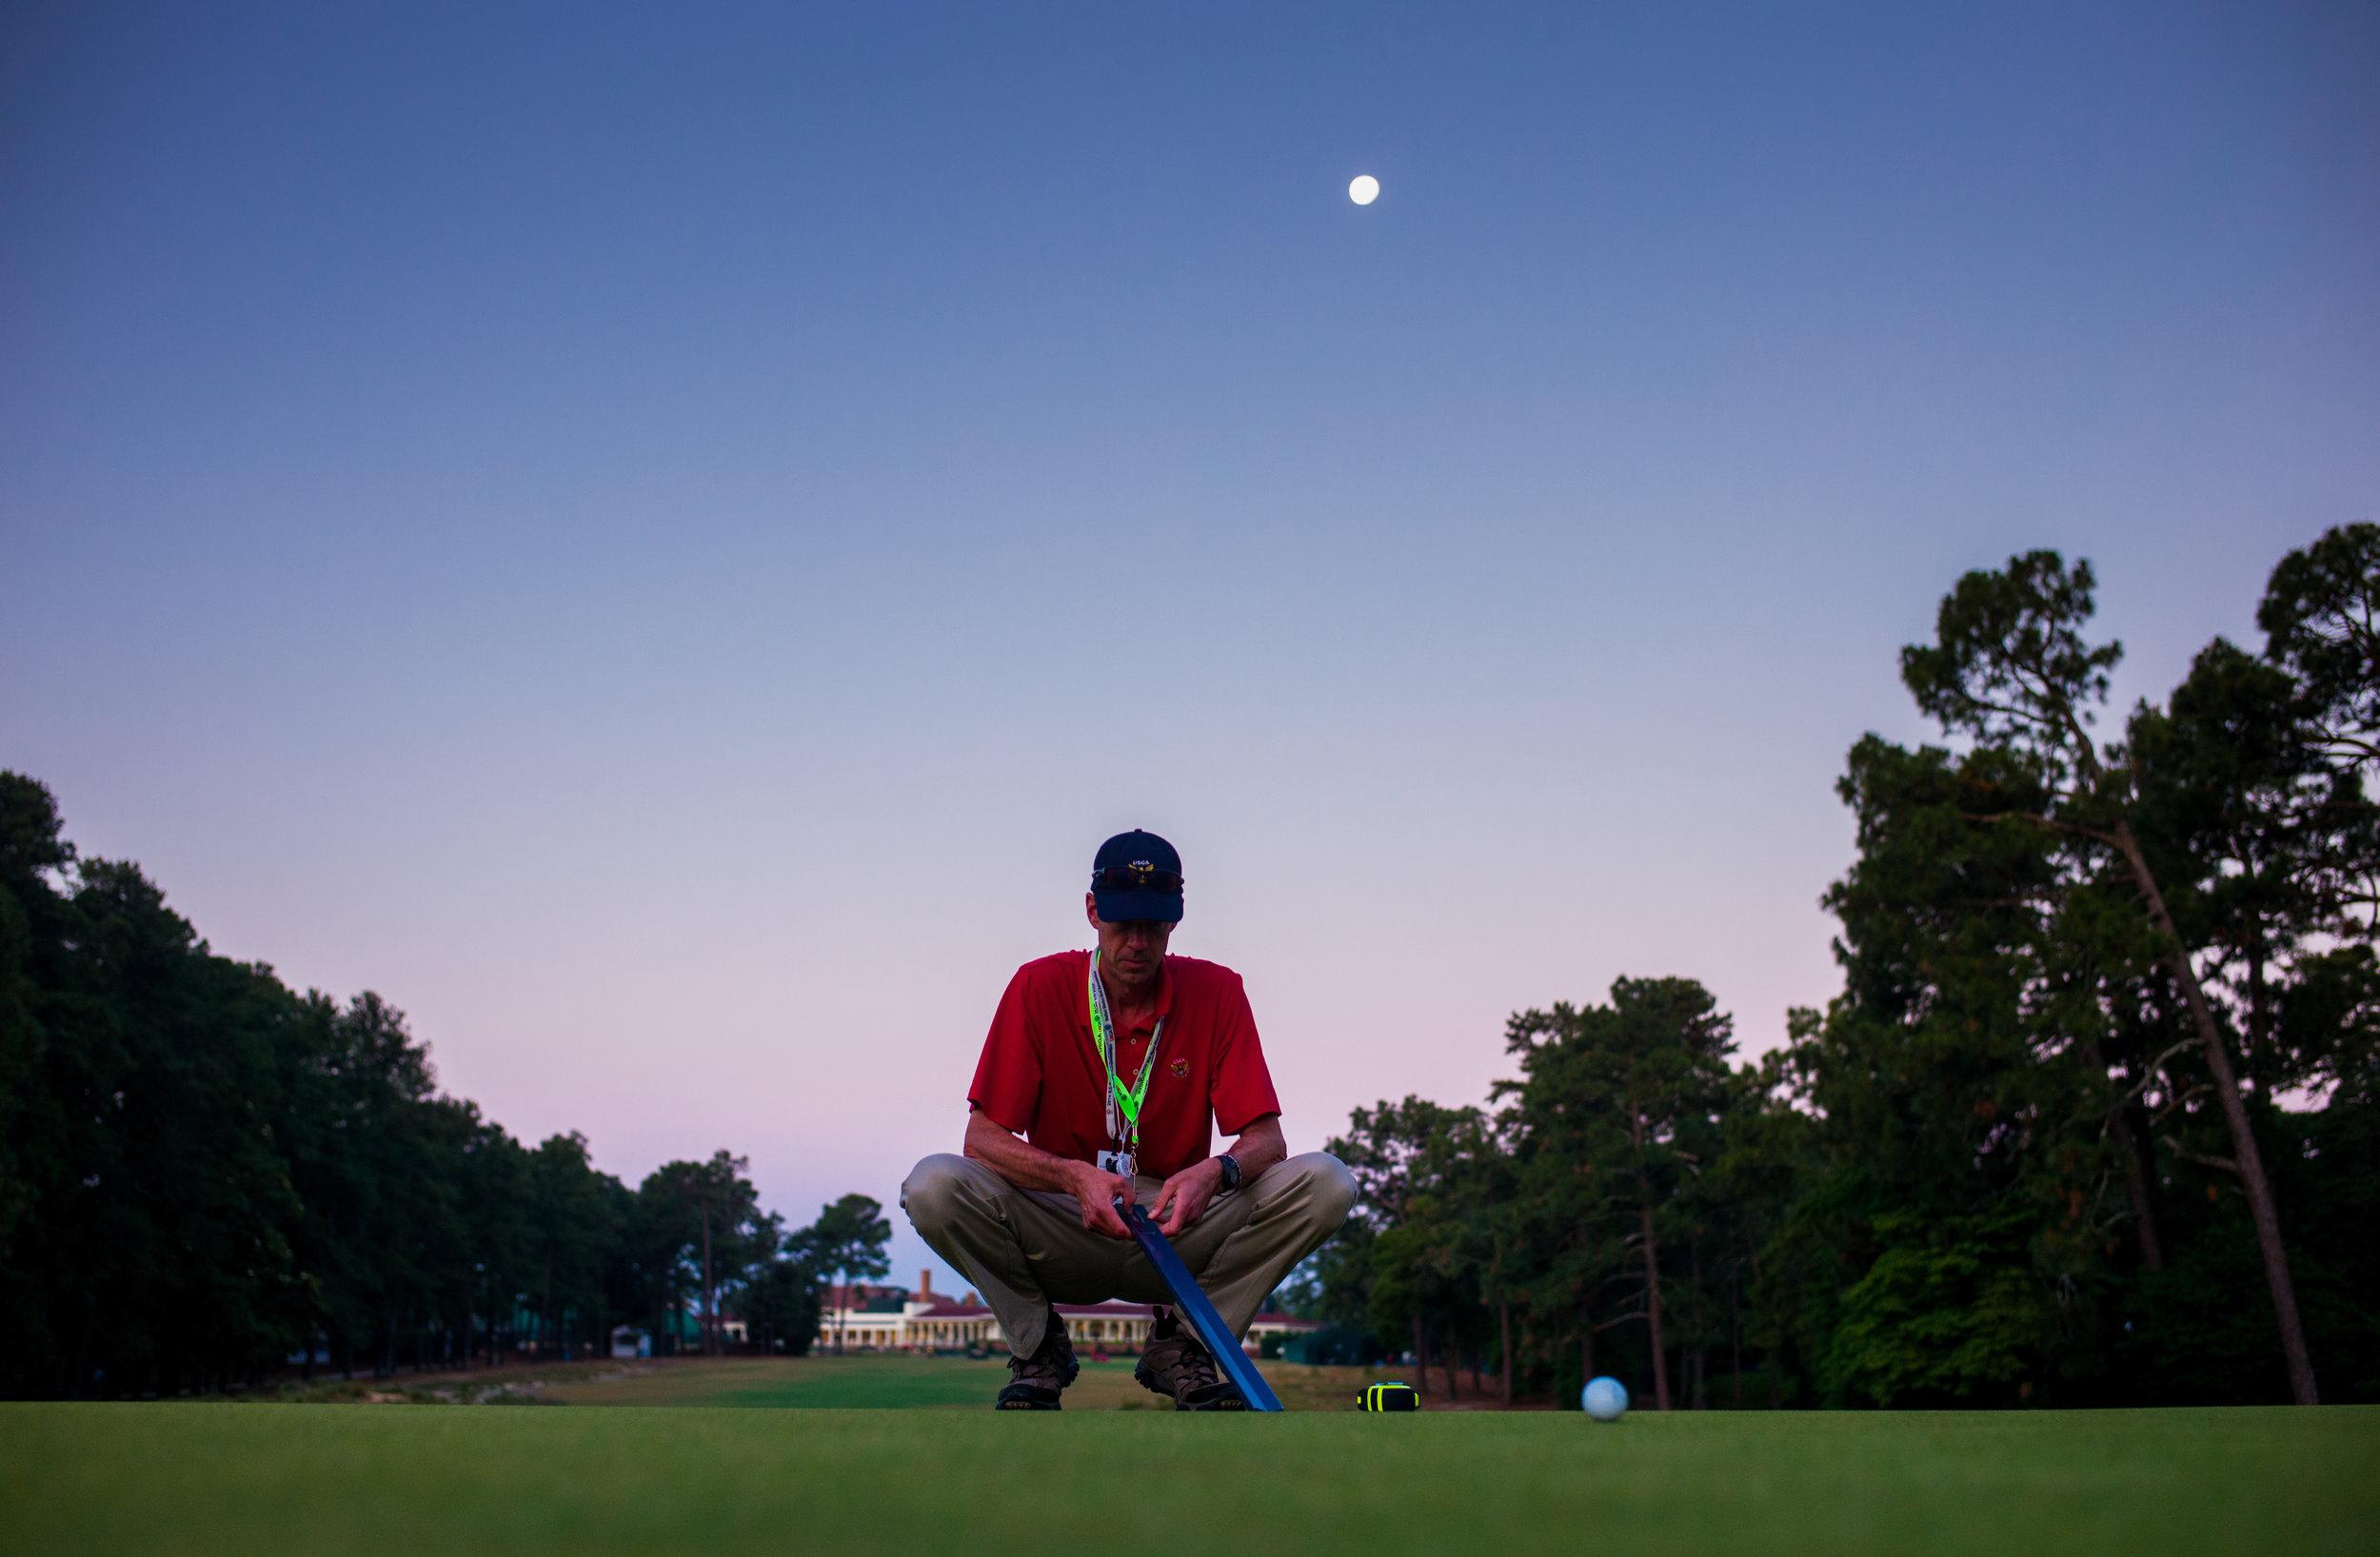 USGA agronomist Chris Hartwiger measures green speed,2014 U.S. Open Championship .  Pinehurst #2, Pinehurst, North Carolina . Canon 1DX, Canon EF 24-70mm f2.8L